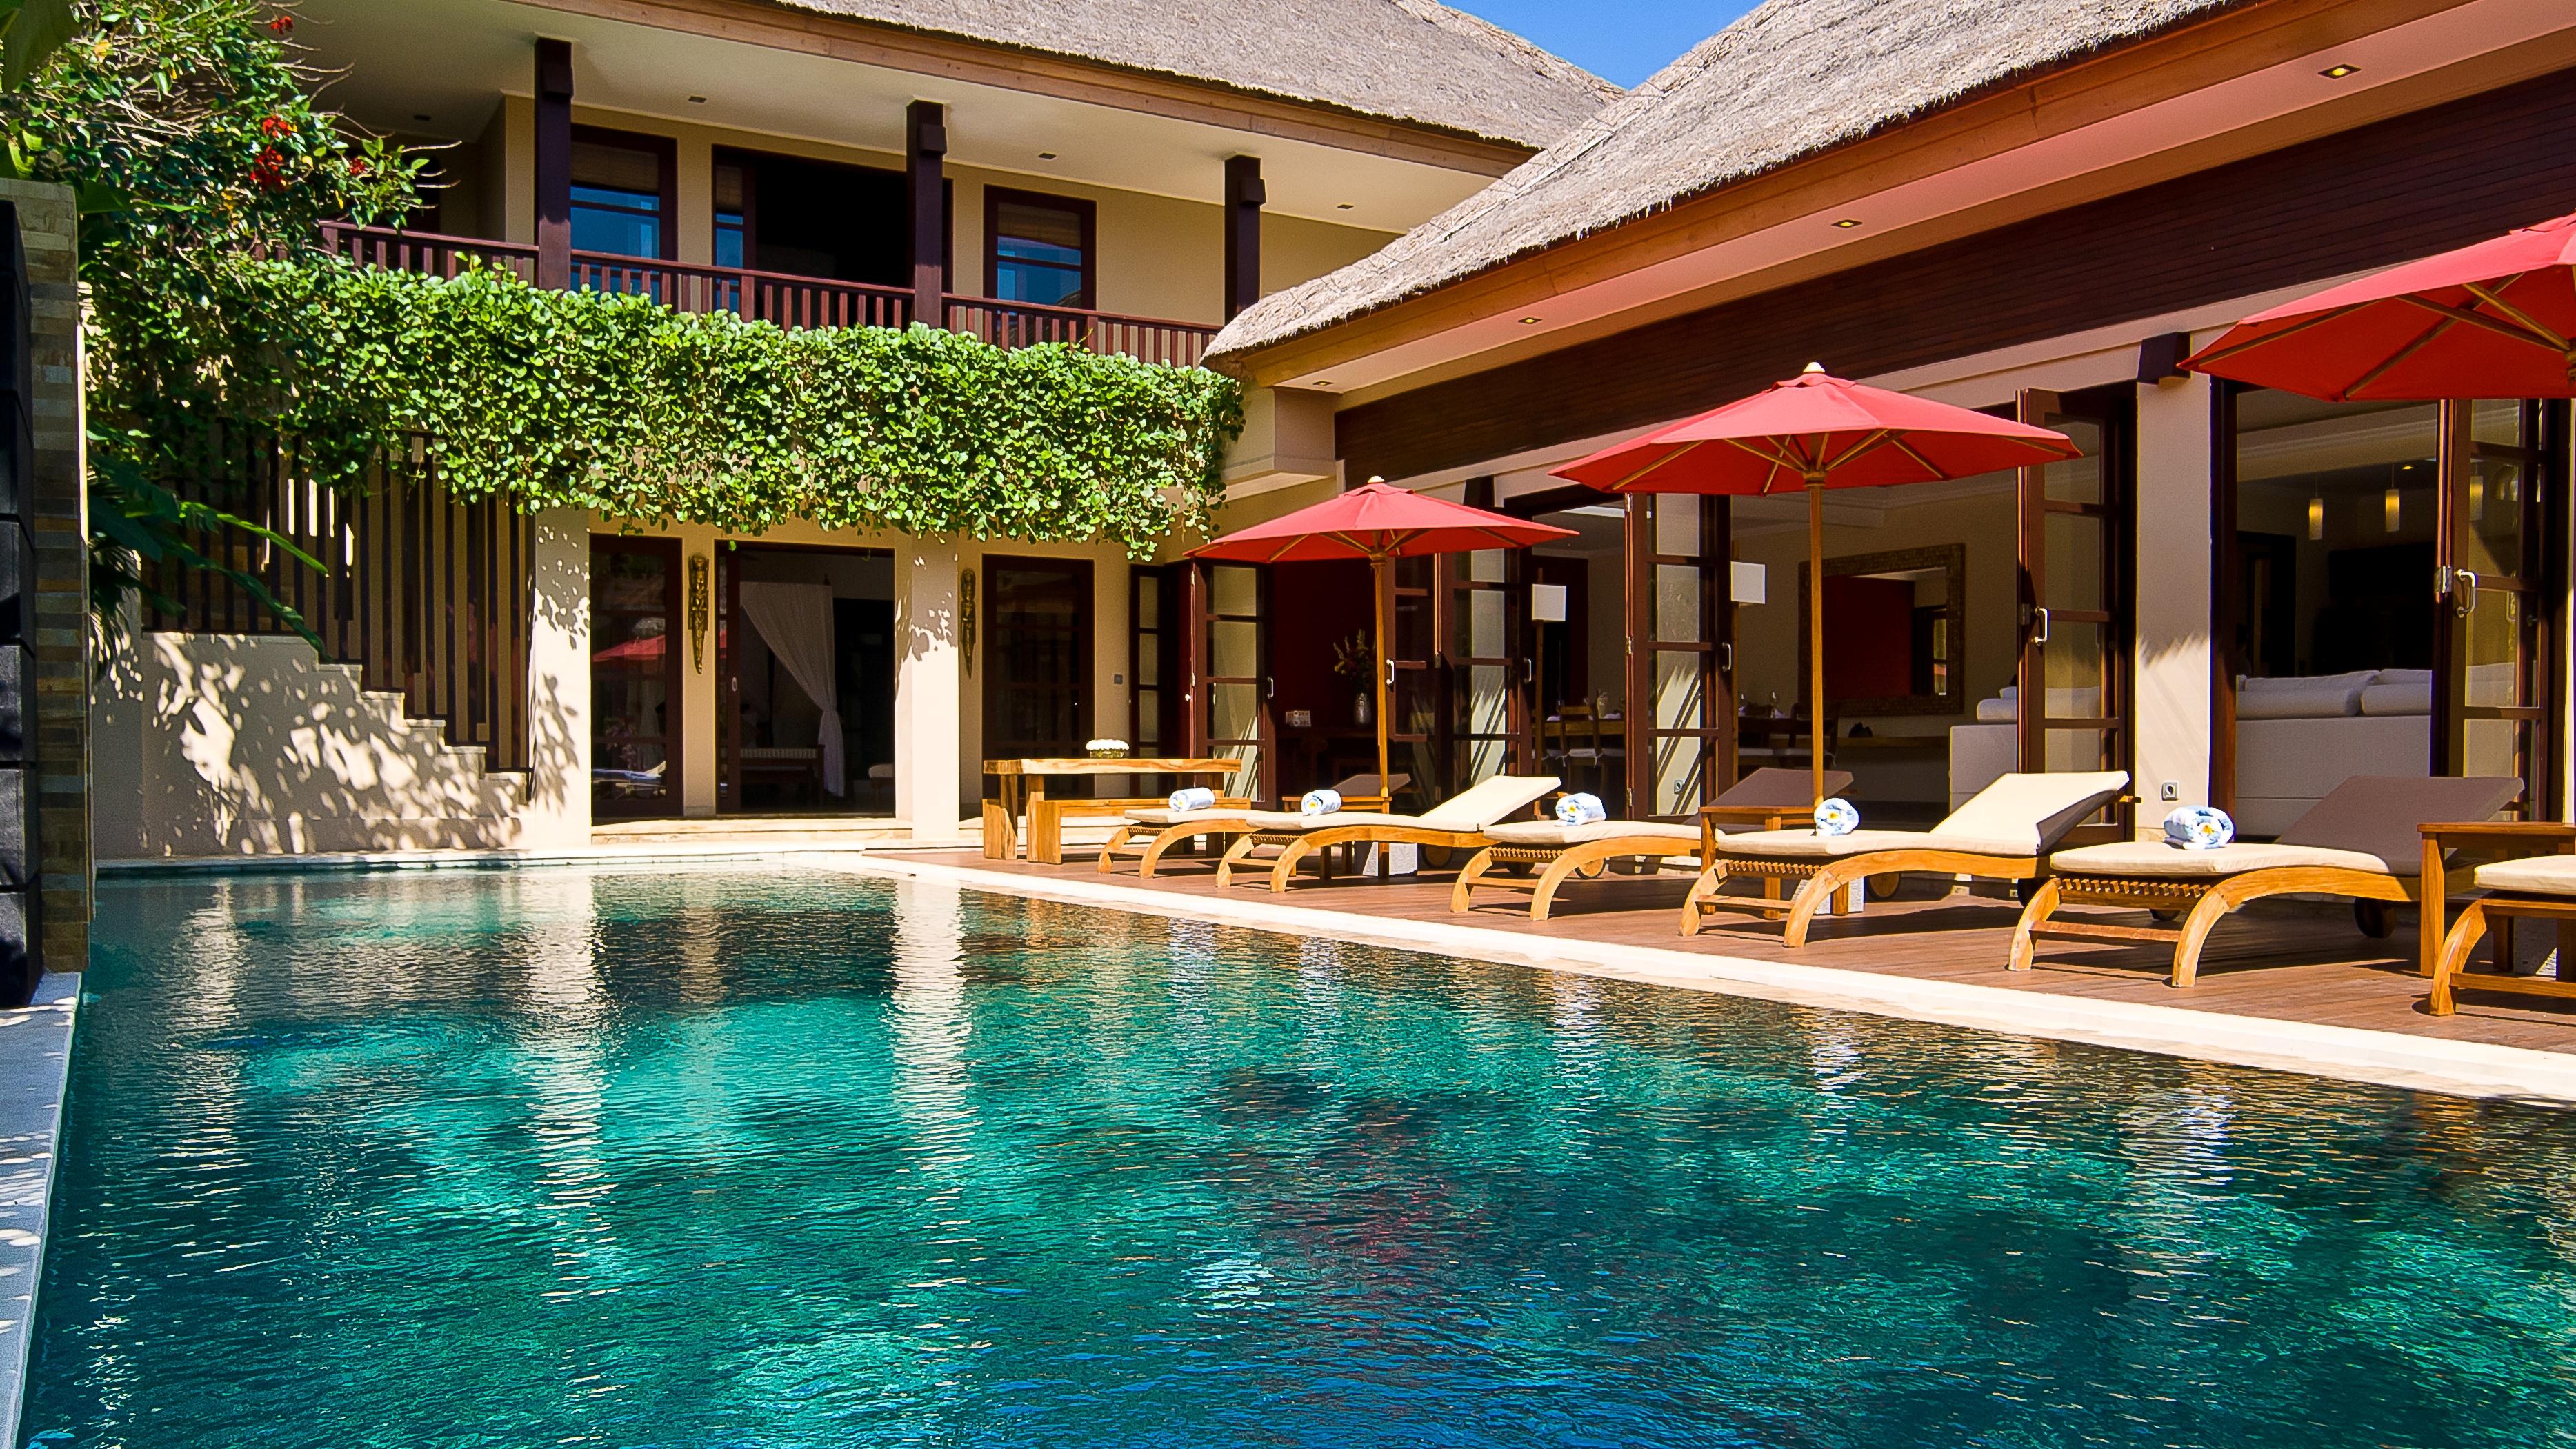 Pool - Villa Nilaya Residence - Seminyak, Bali